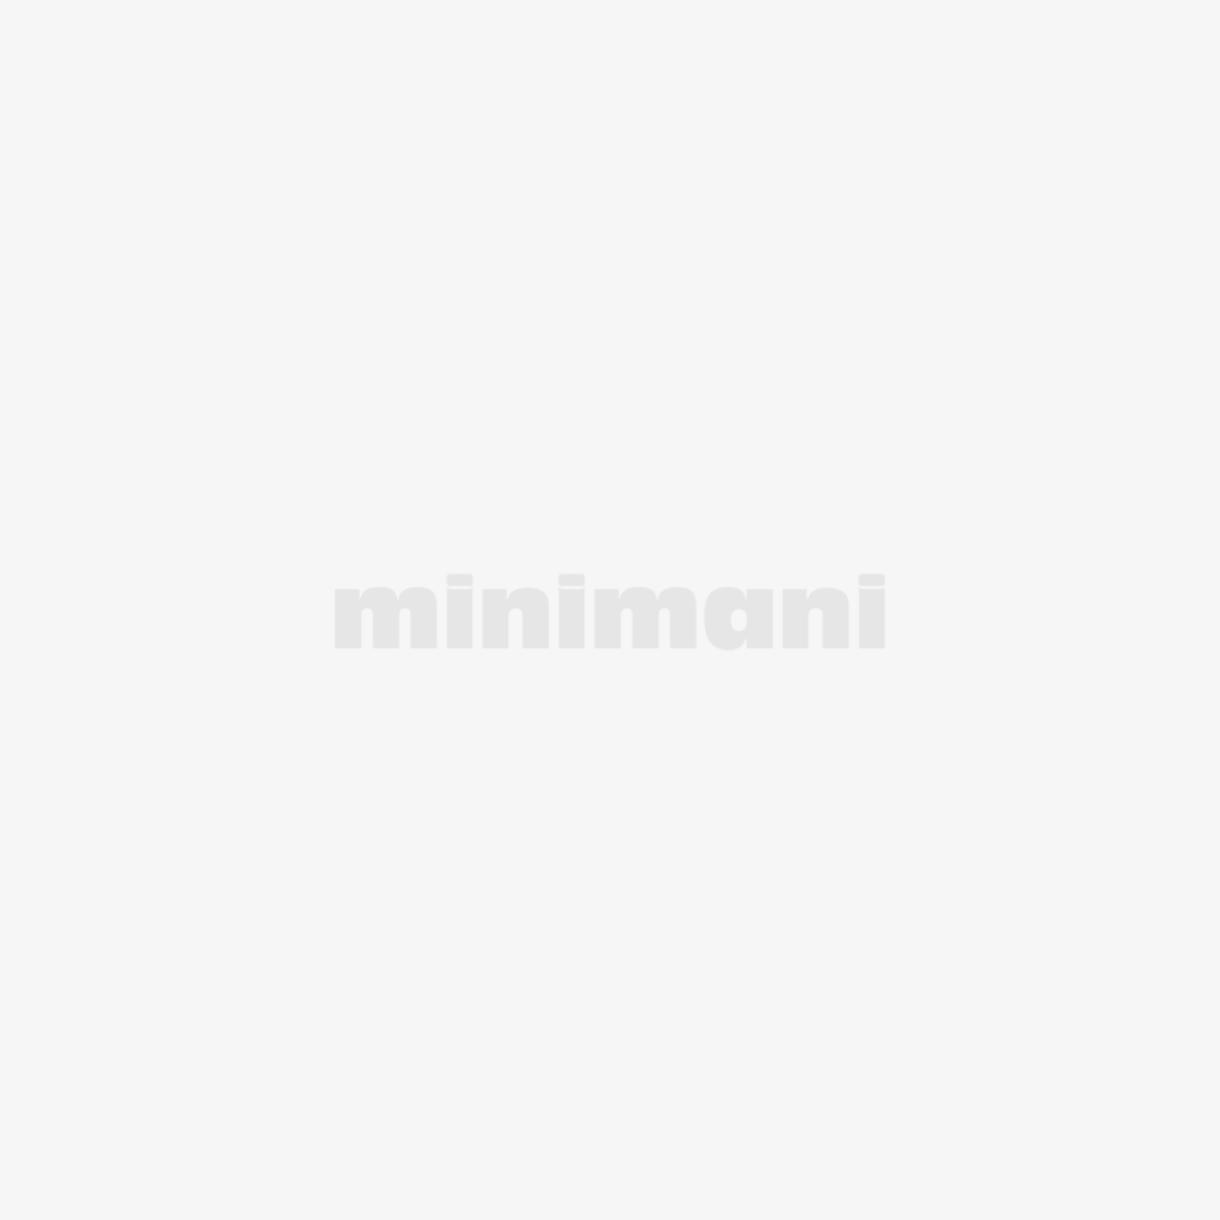 EMENDO SAUNAHETKI:2X10ML EUKA + SAVUSAUNA+MUSTAVALKOINEN PESUKU